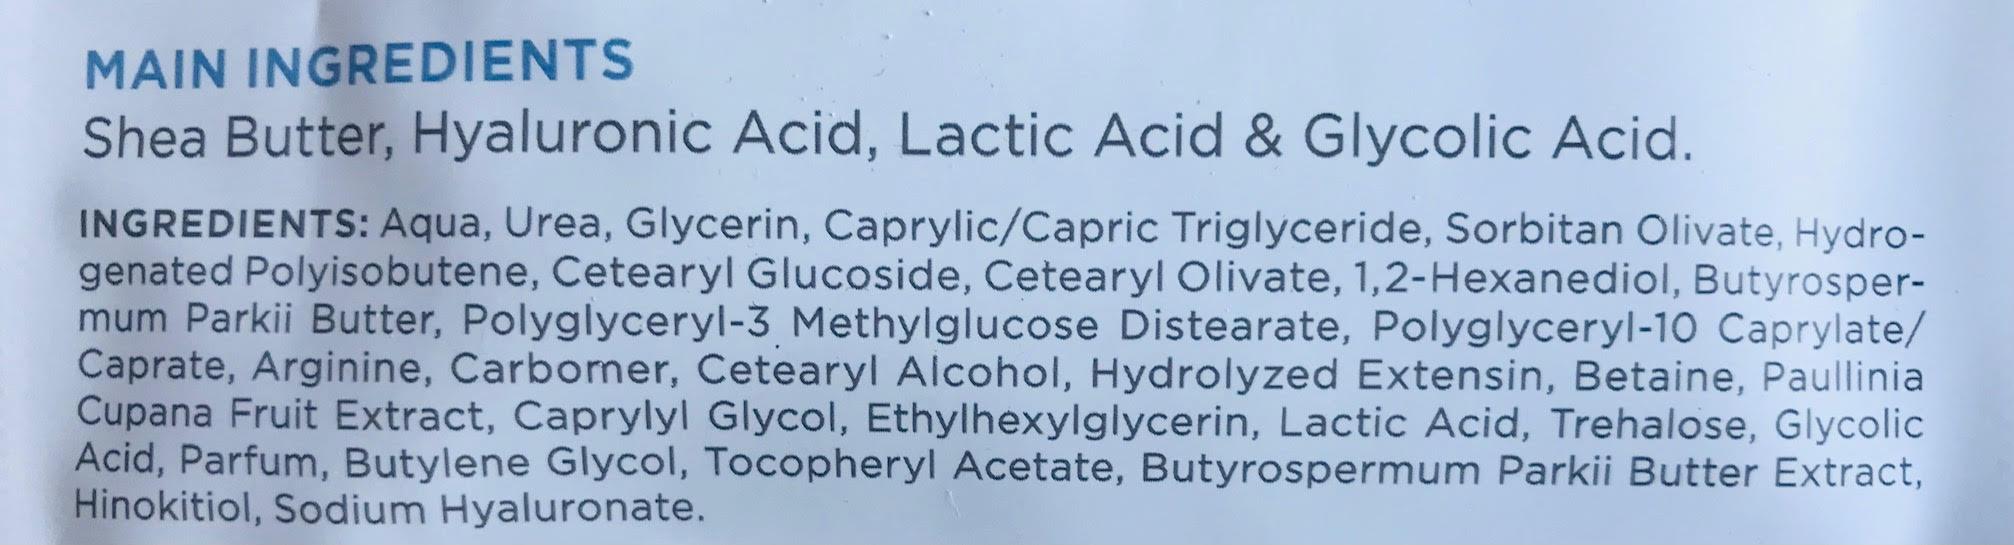 ingredienten ici paris xl voetmasker